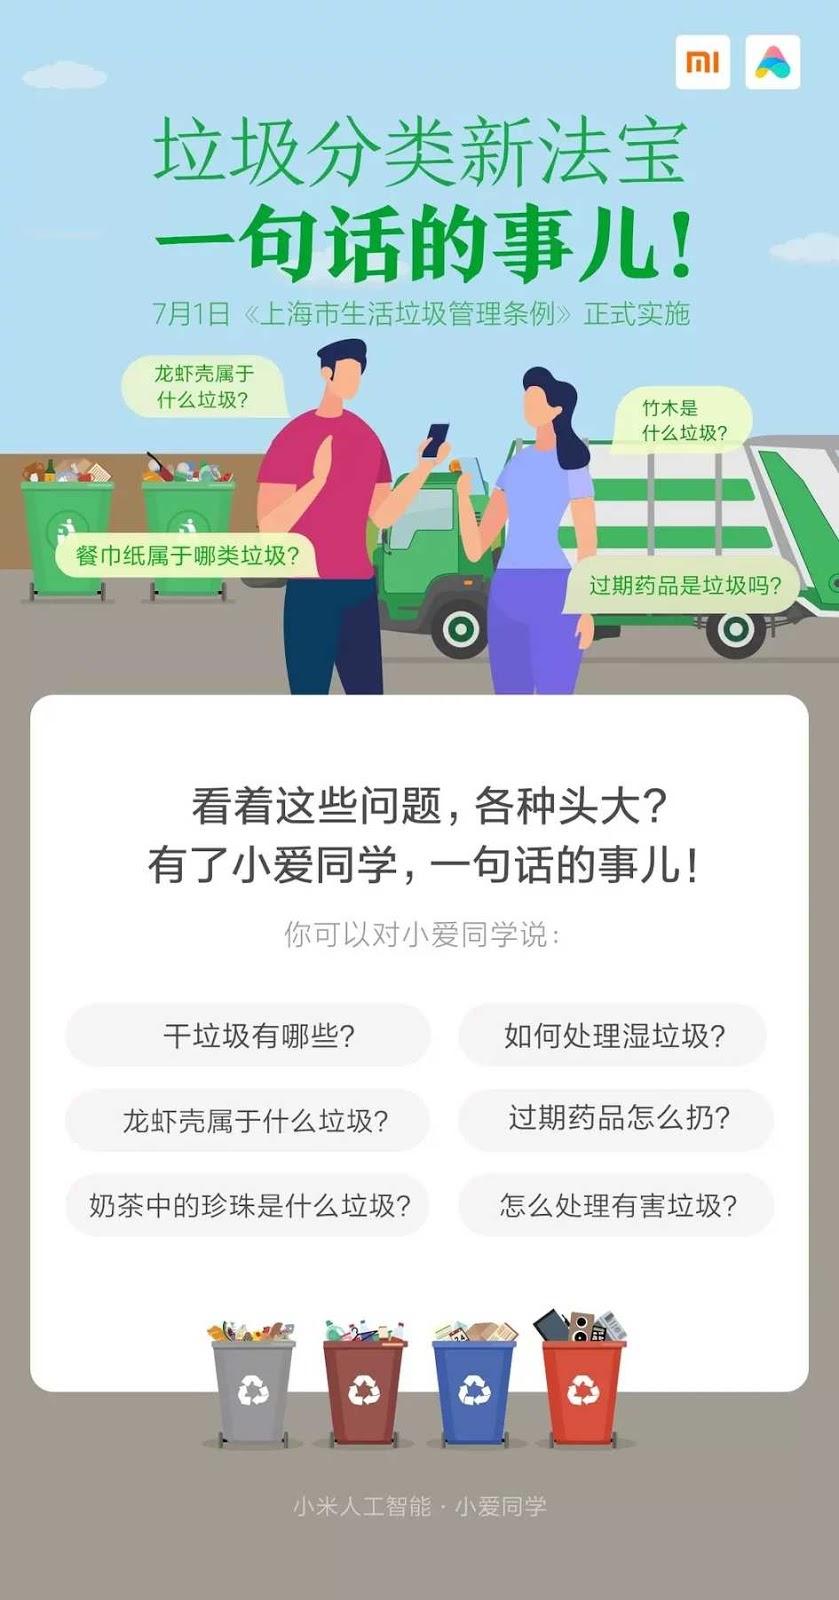 Klasifikasi Penyimpanan Xiao Ai (gizmochina.com)